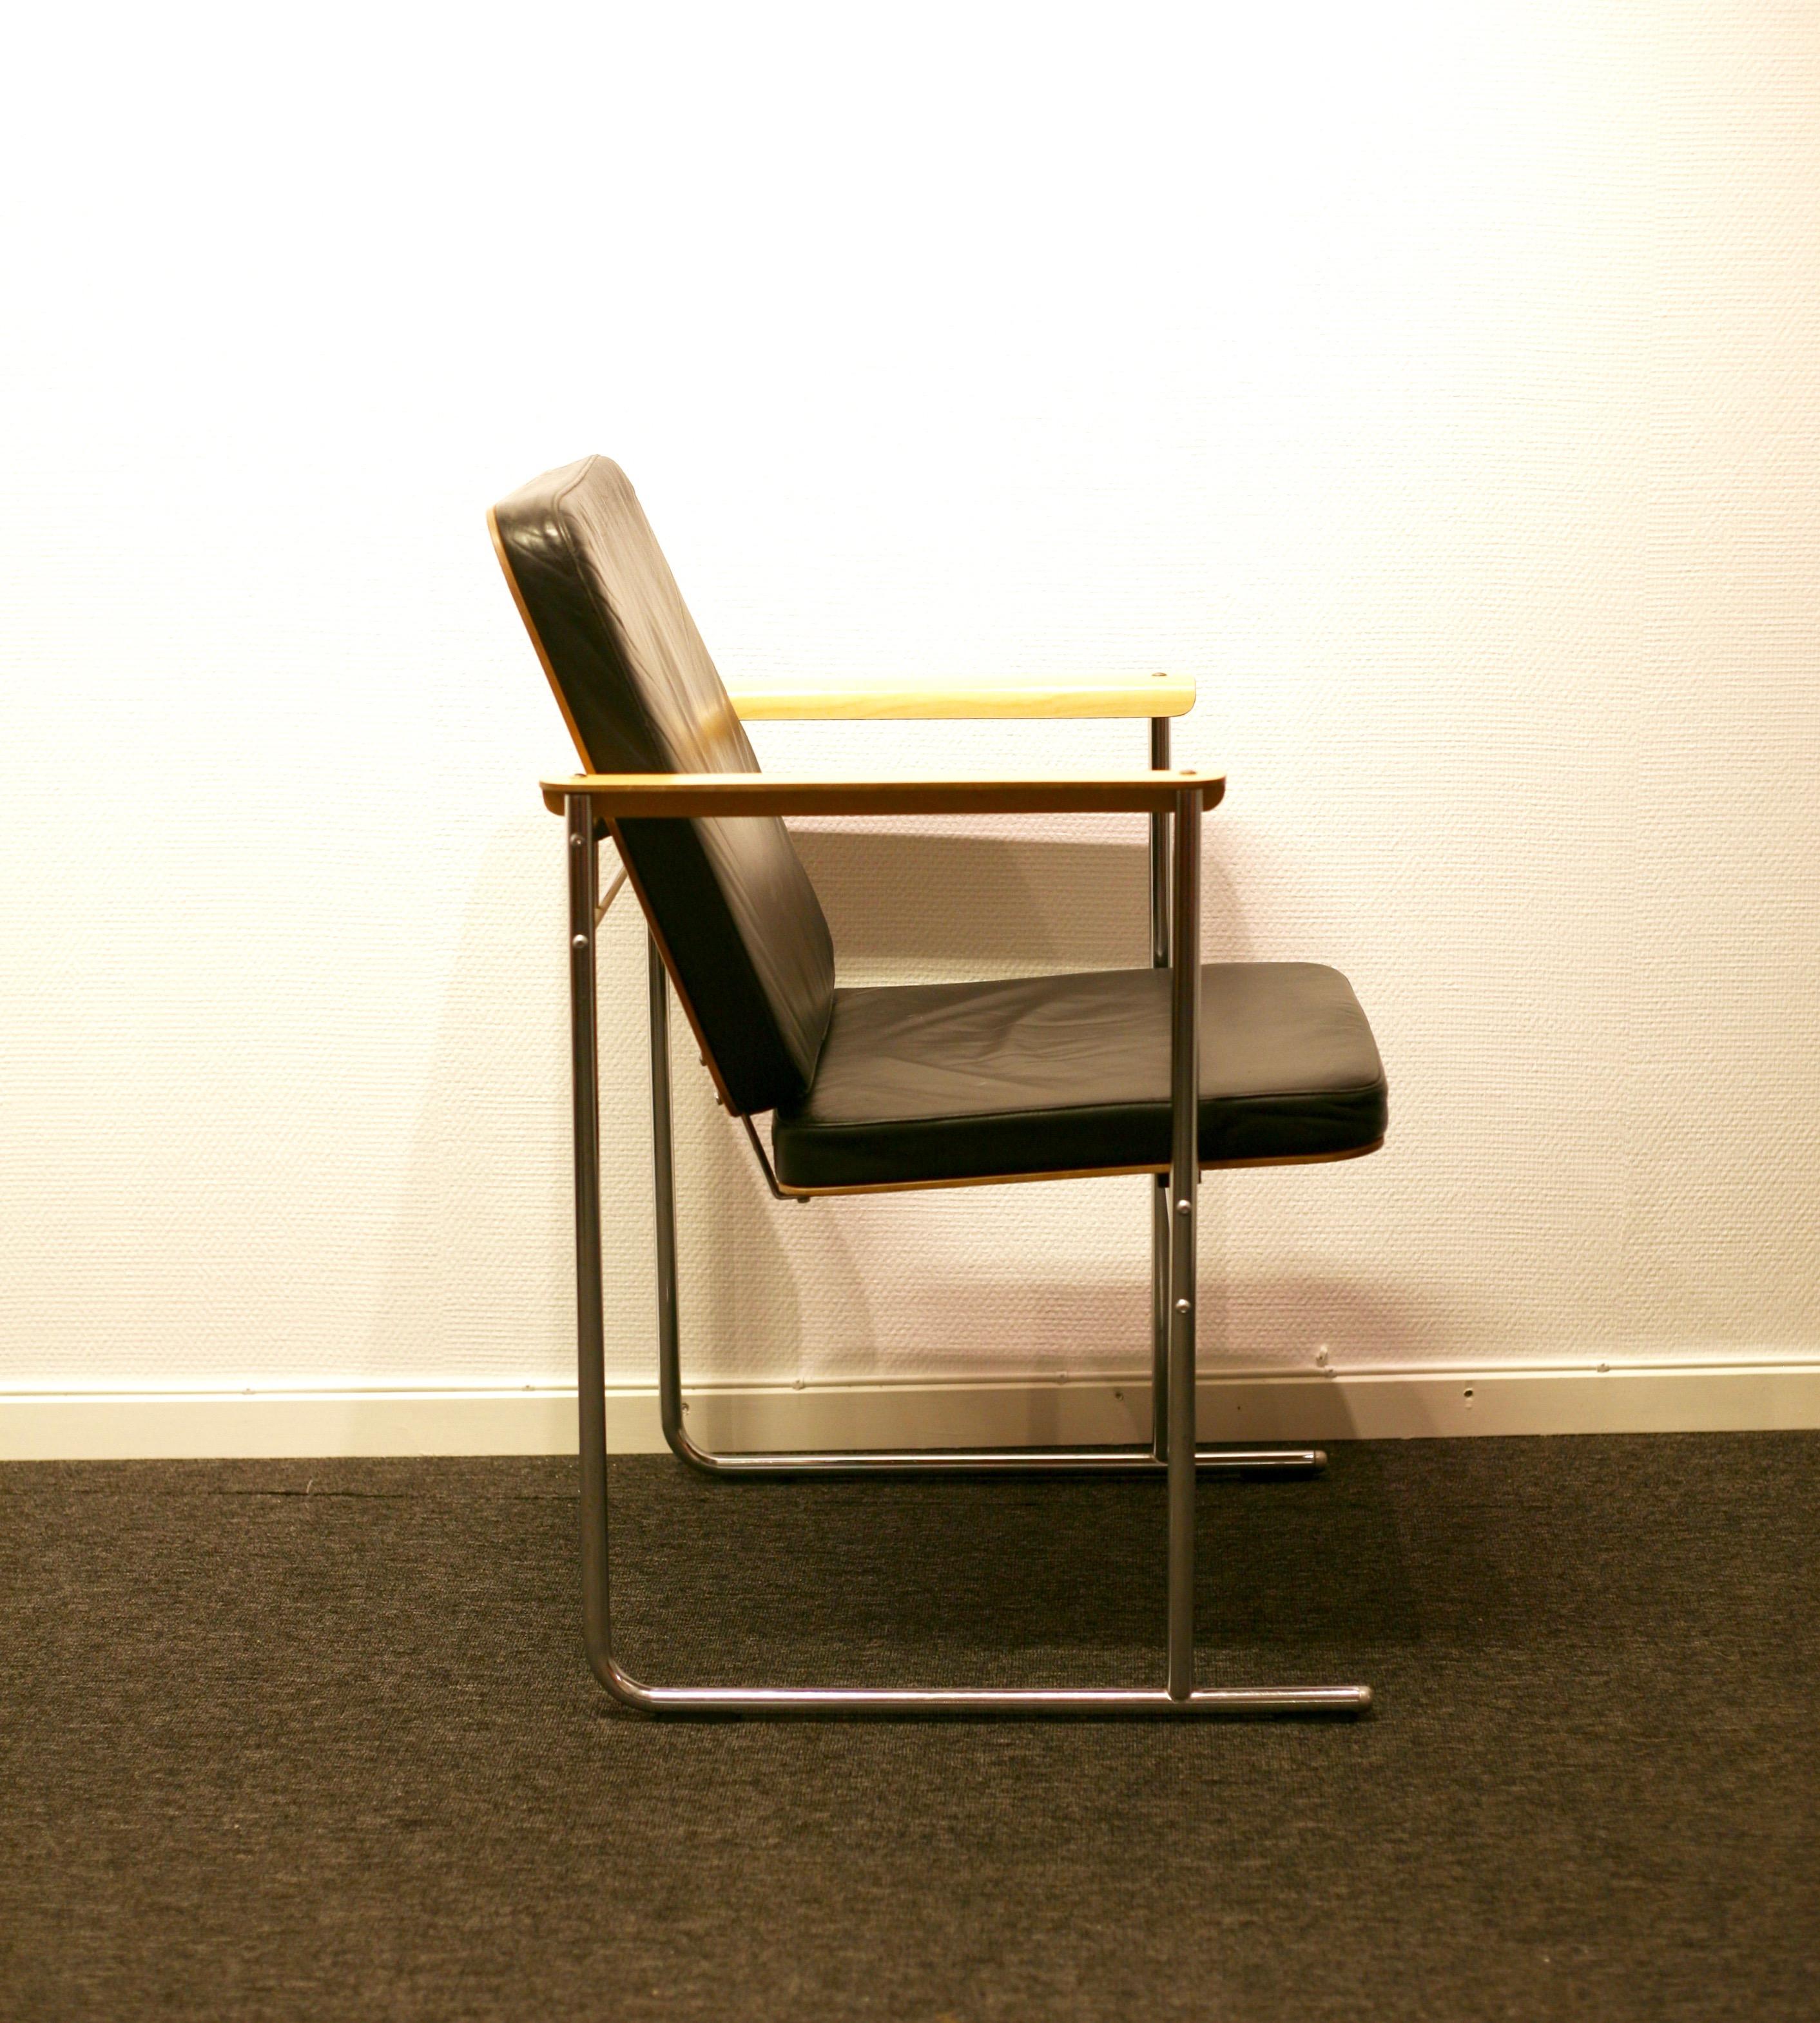 2 Skaala chairs by Yrjö Kukkapuro for Avarte